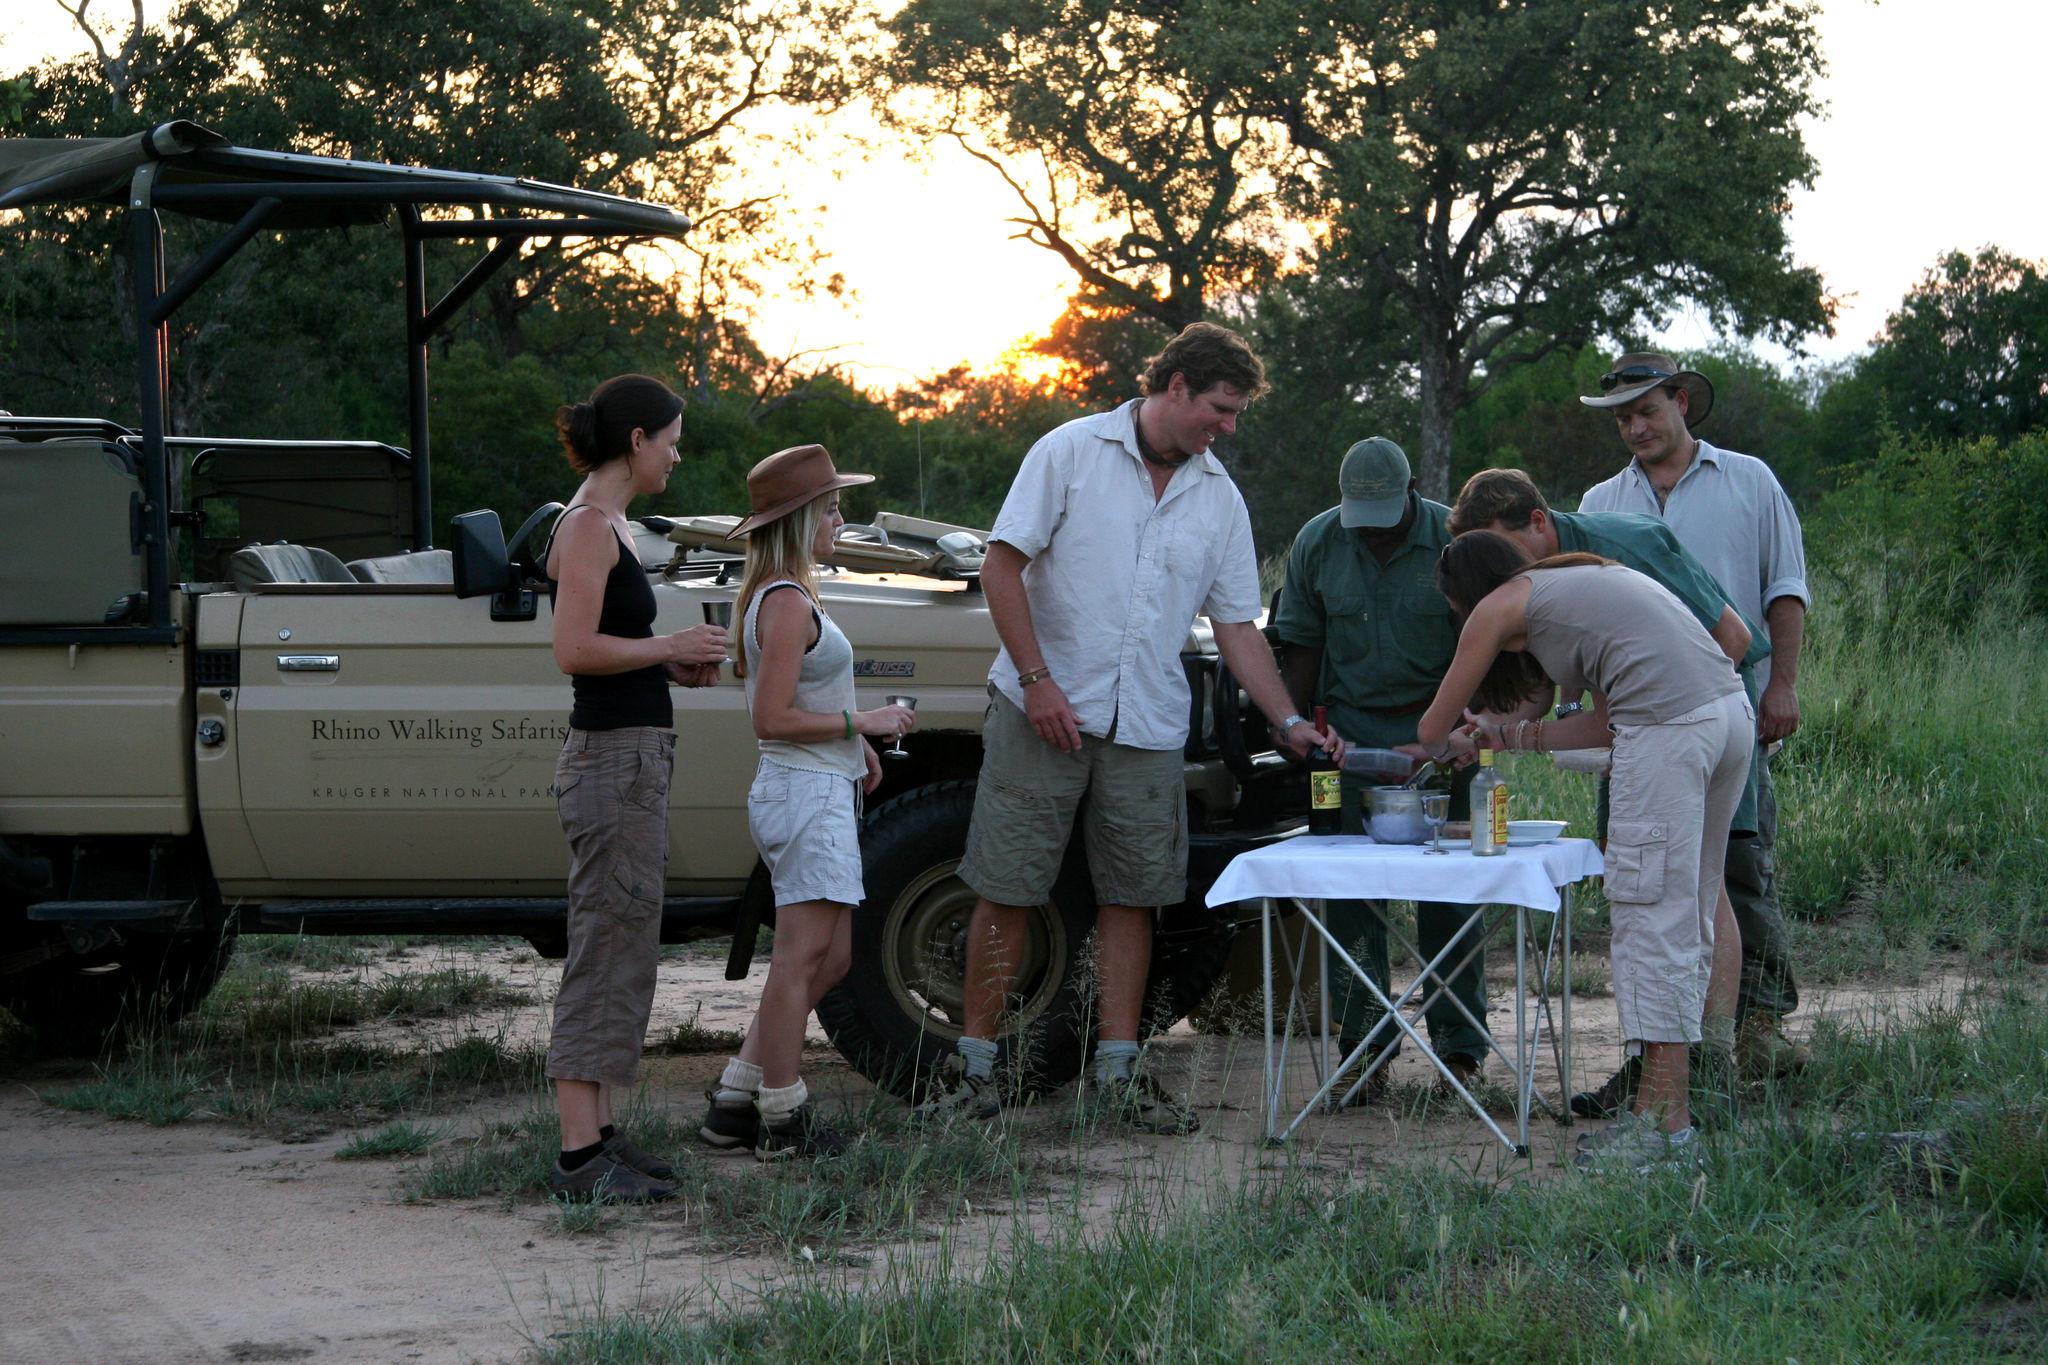 Bush break while on Safari in the Kruger National Park